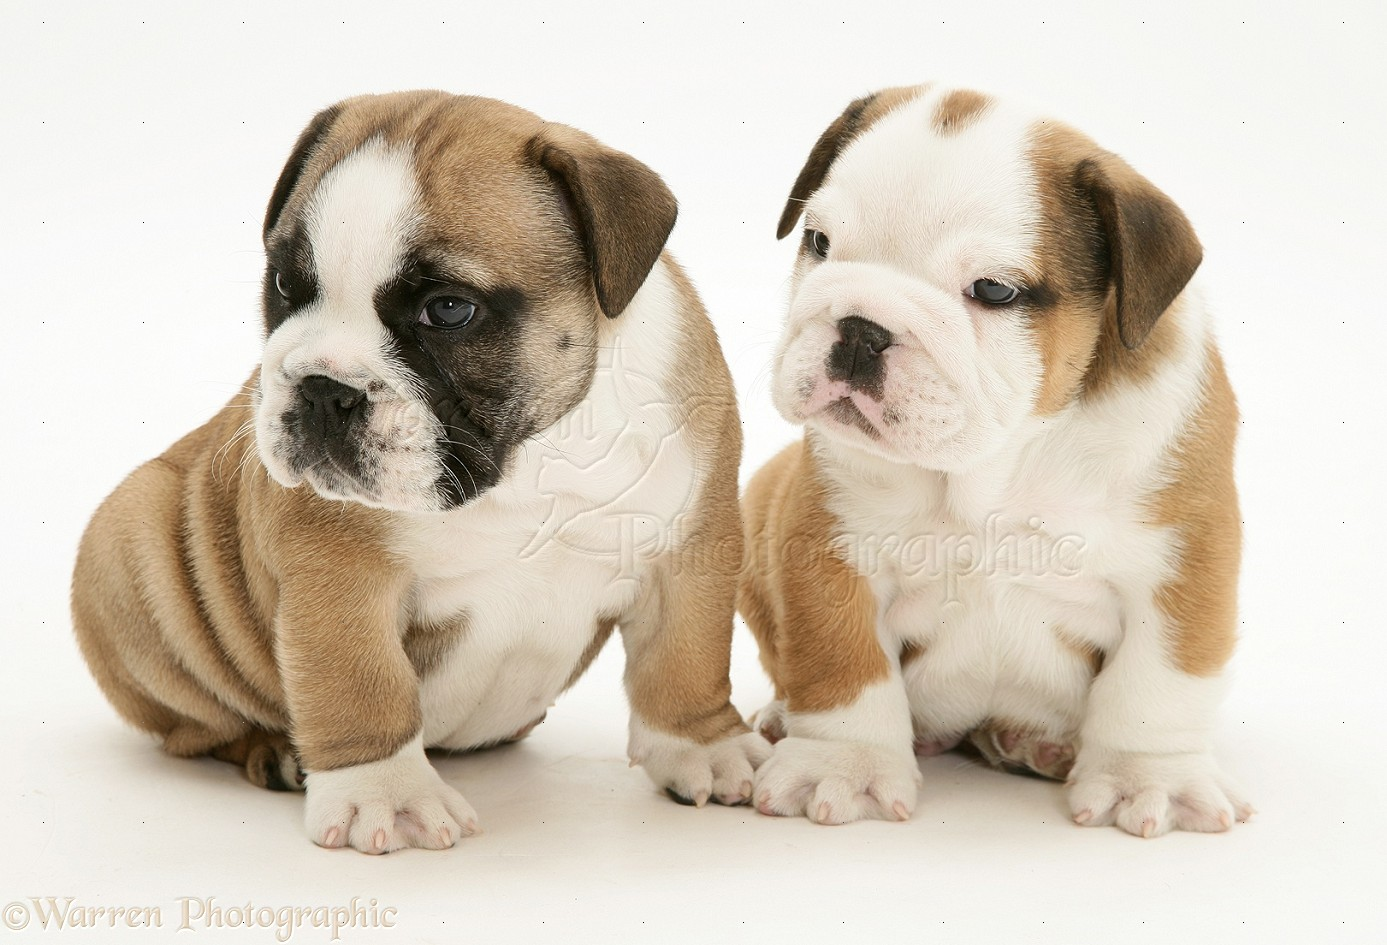 Bulldog pups photo - WP12037